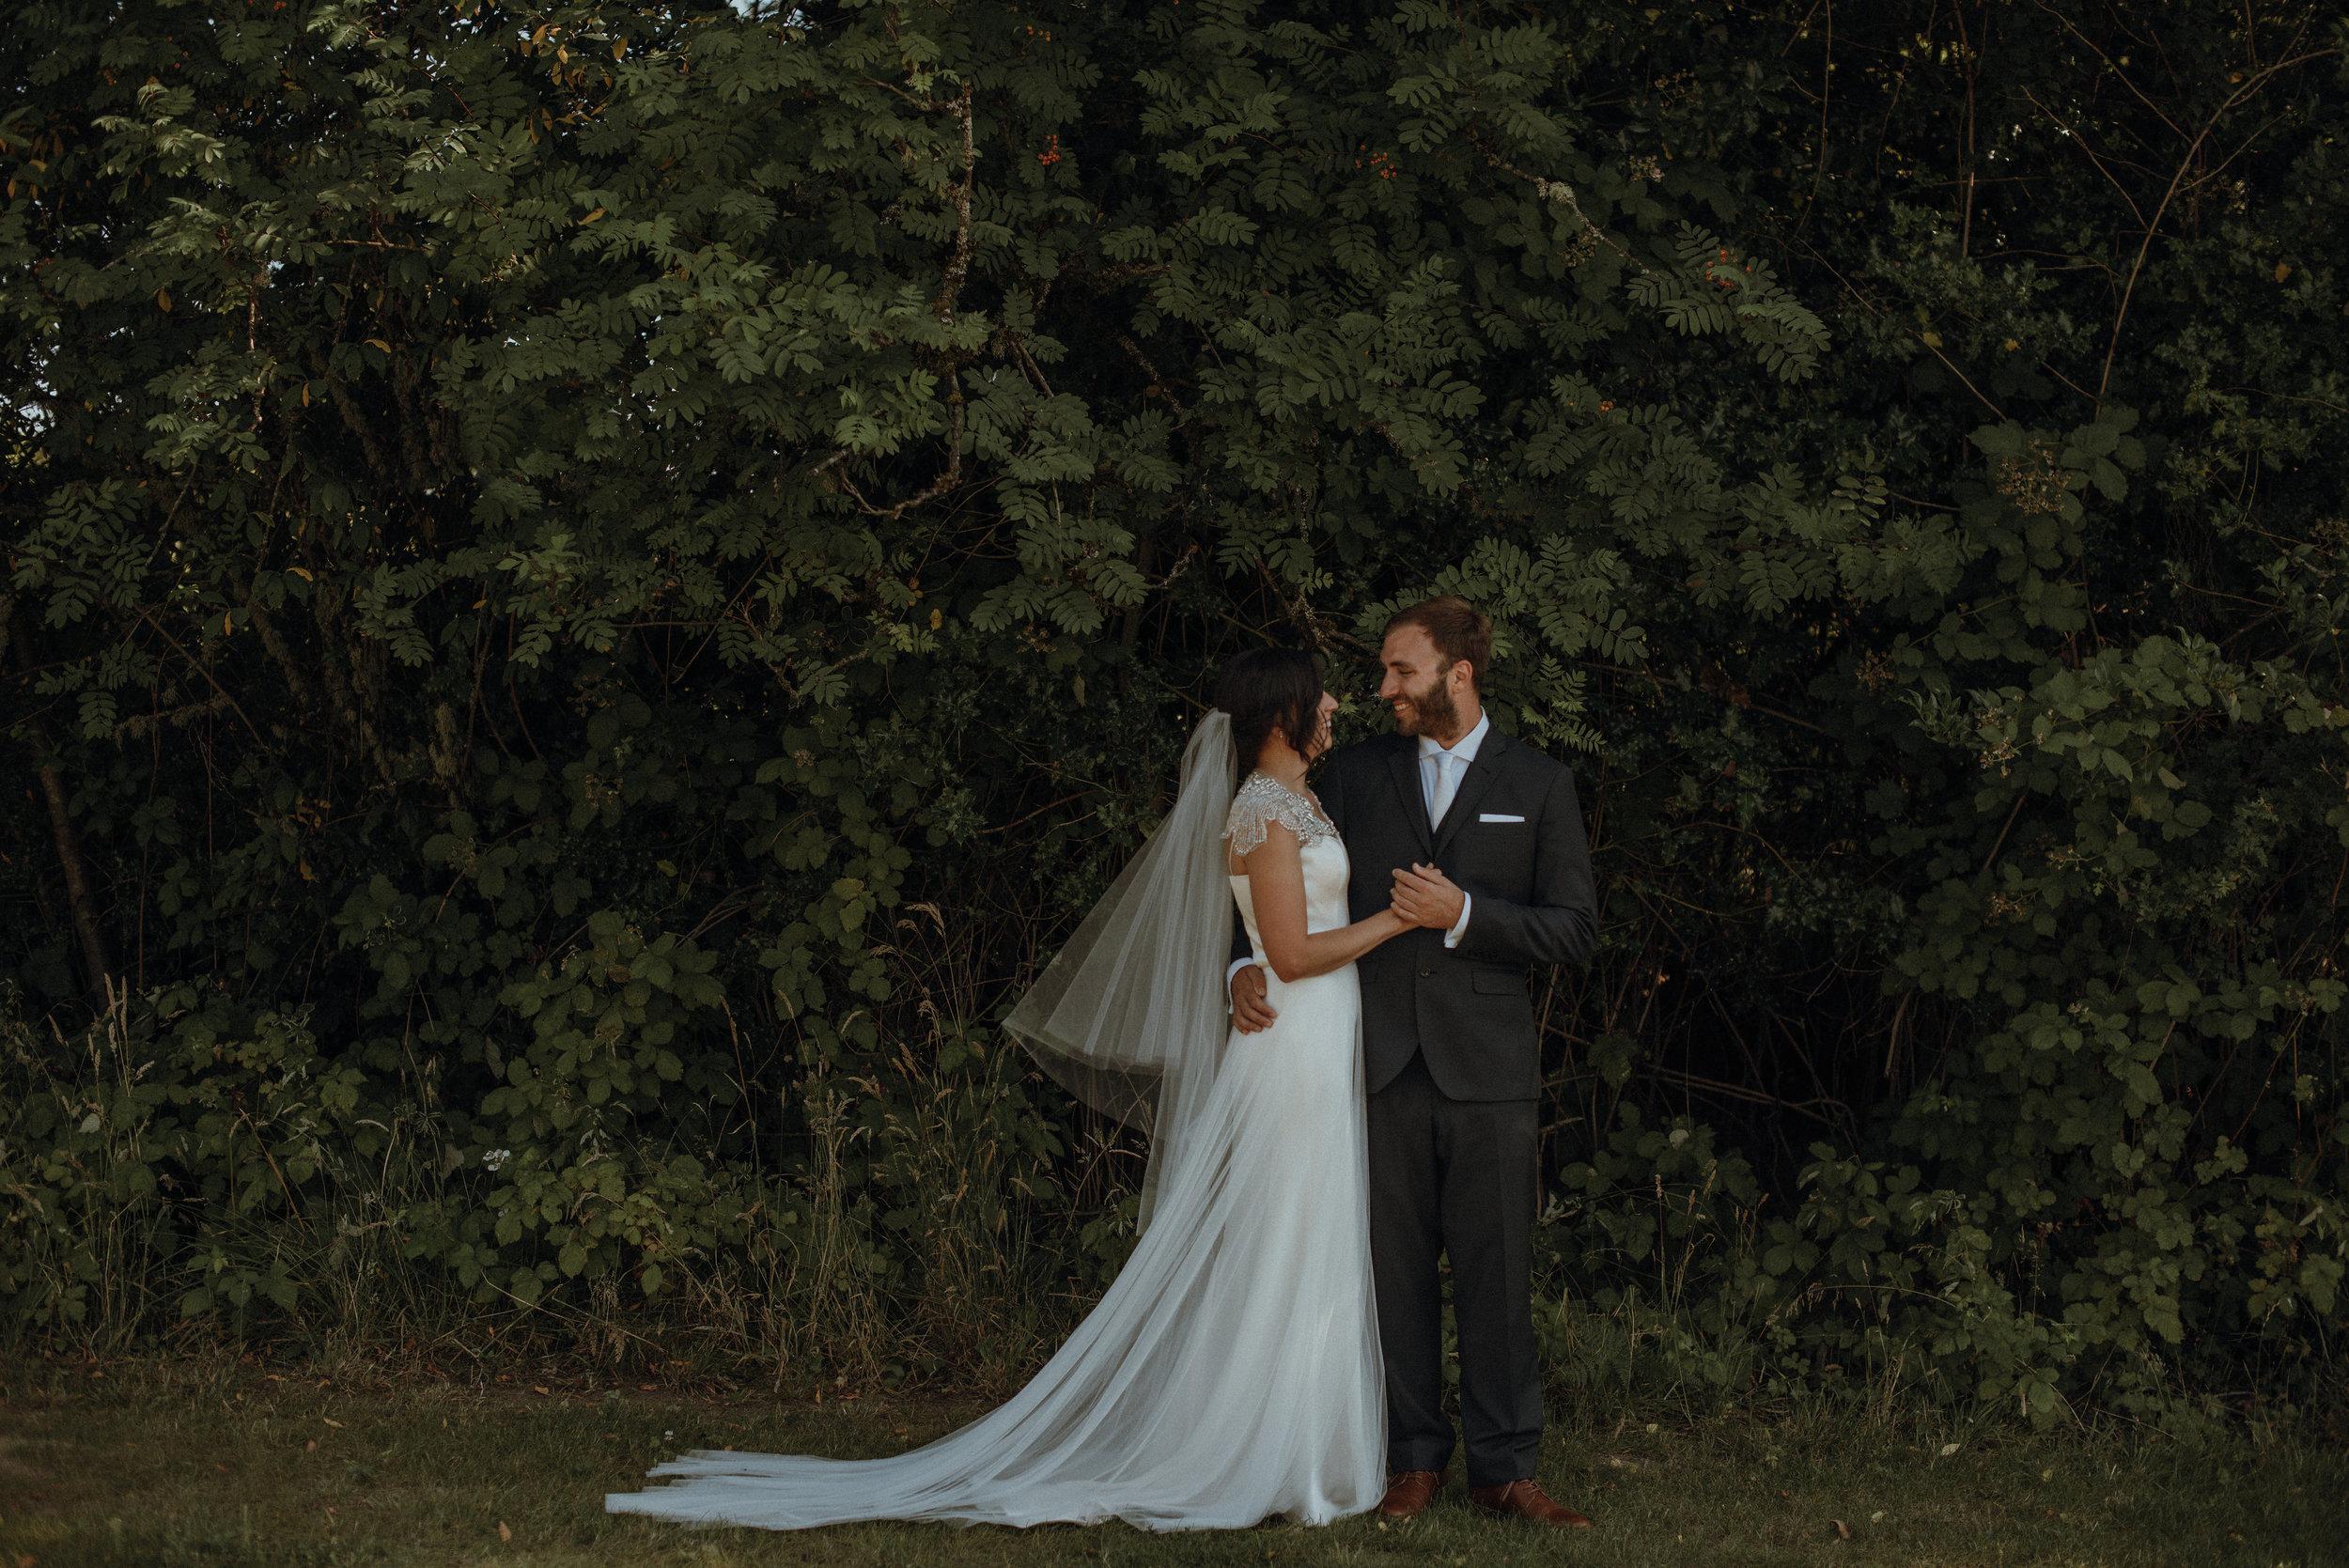 Lodges-at-Vashon-Wedding29.jpg